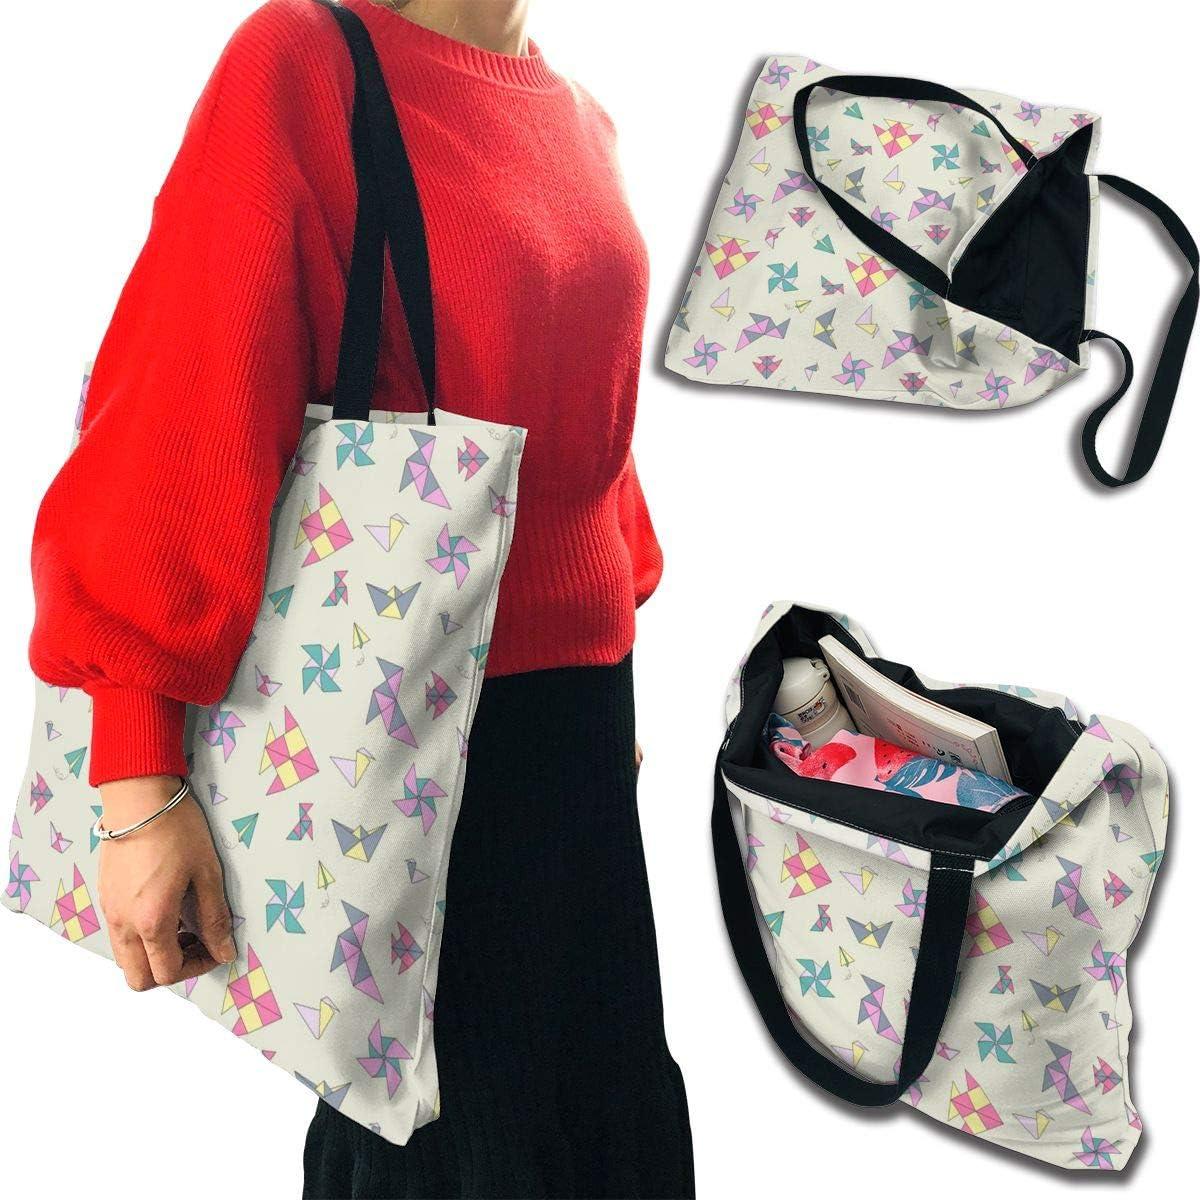 PengMin Windmill and Kite Fashion Womens Multi-Pocket Vintage Canvas Handbags Miniature Shoulder Bags Totes Purses Shopping Bags